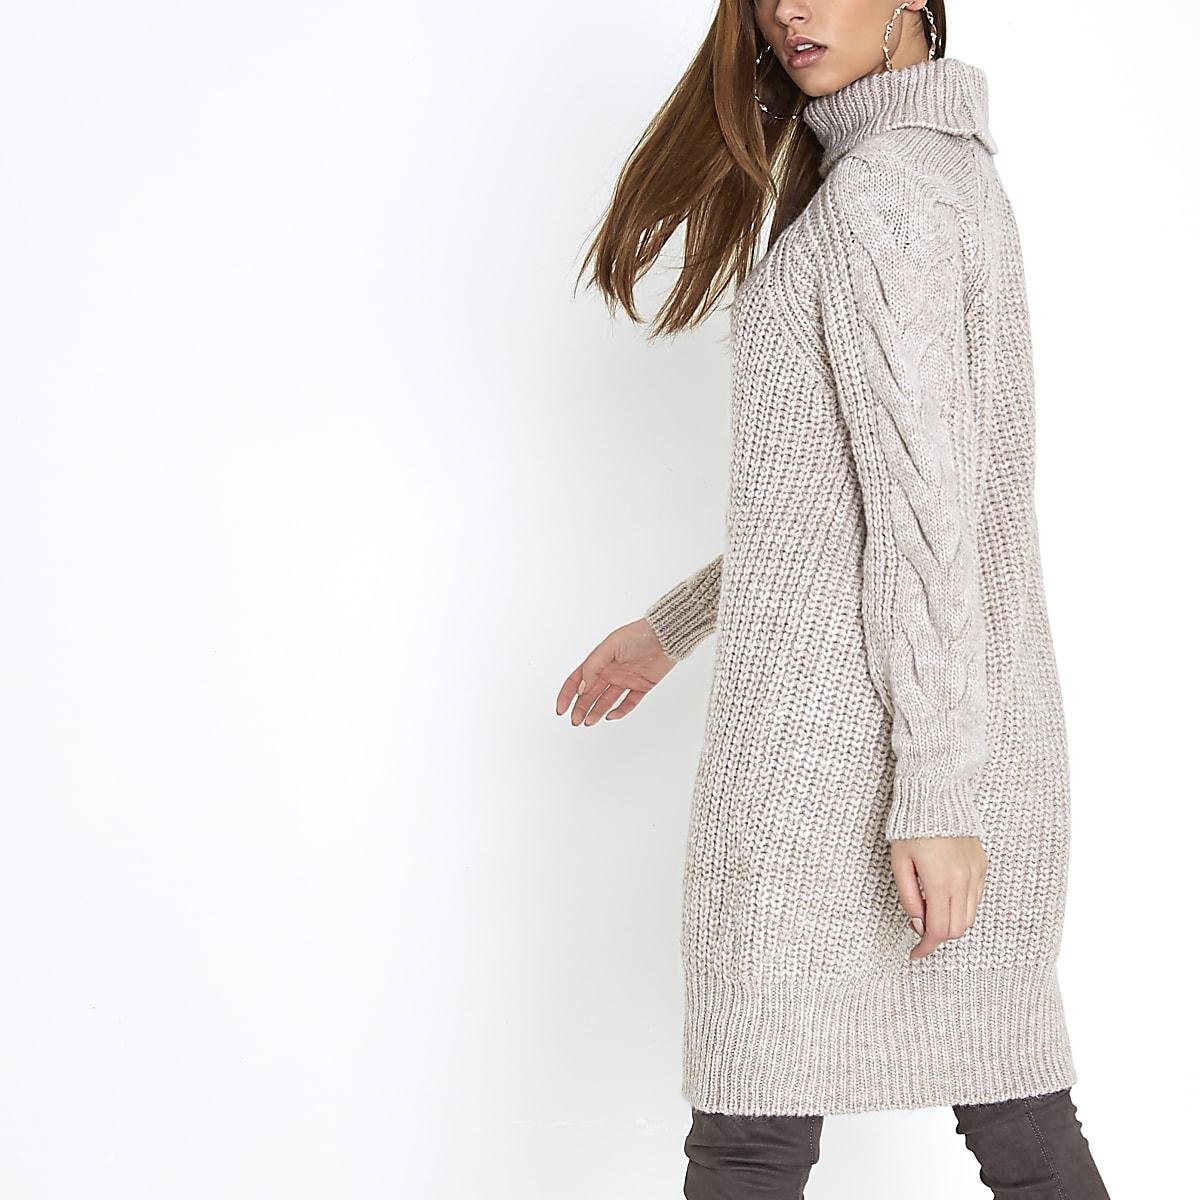 9e38dc6abac071 Beige gebreide trui-jurk met kabels en col - RI Limited Edition - Dames